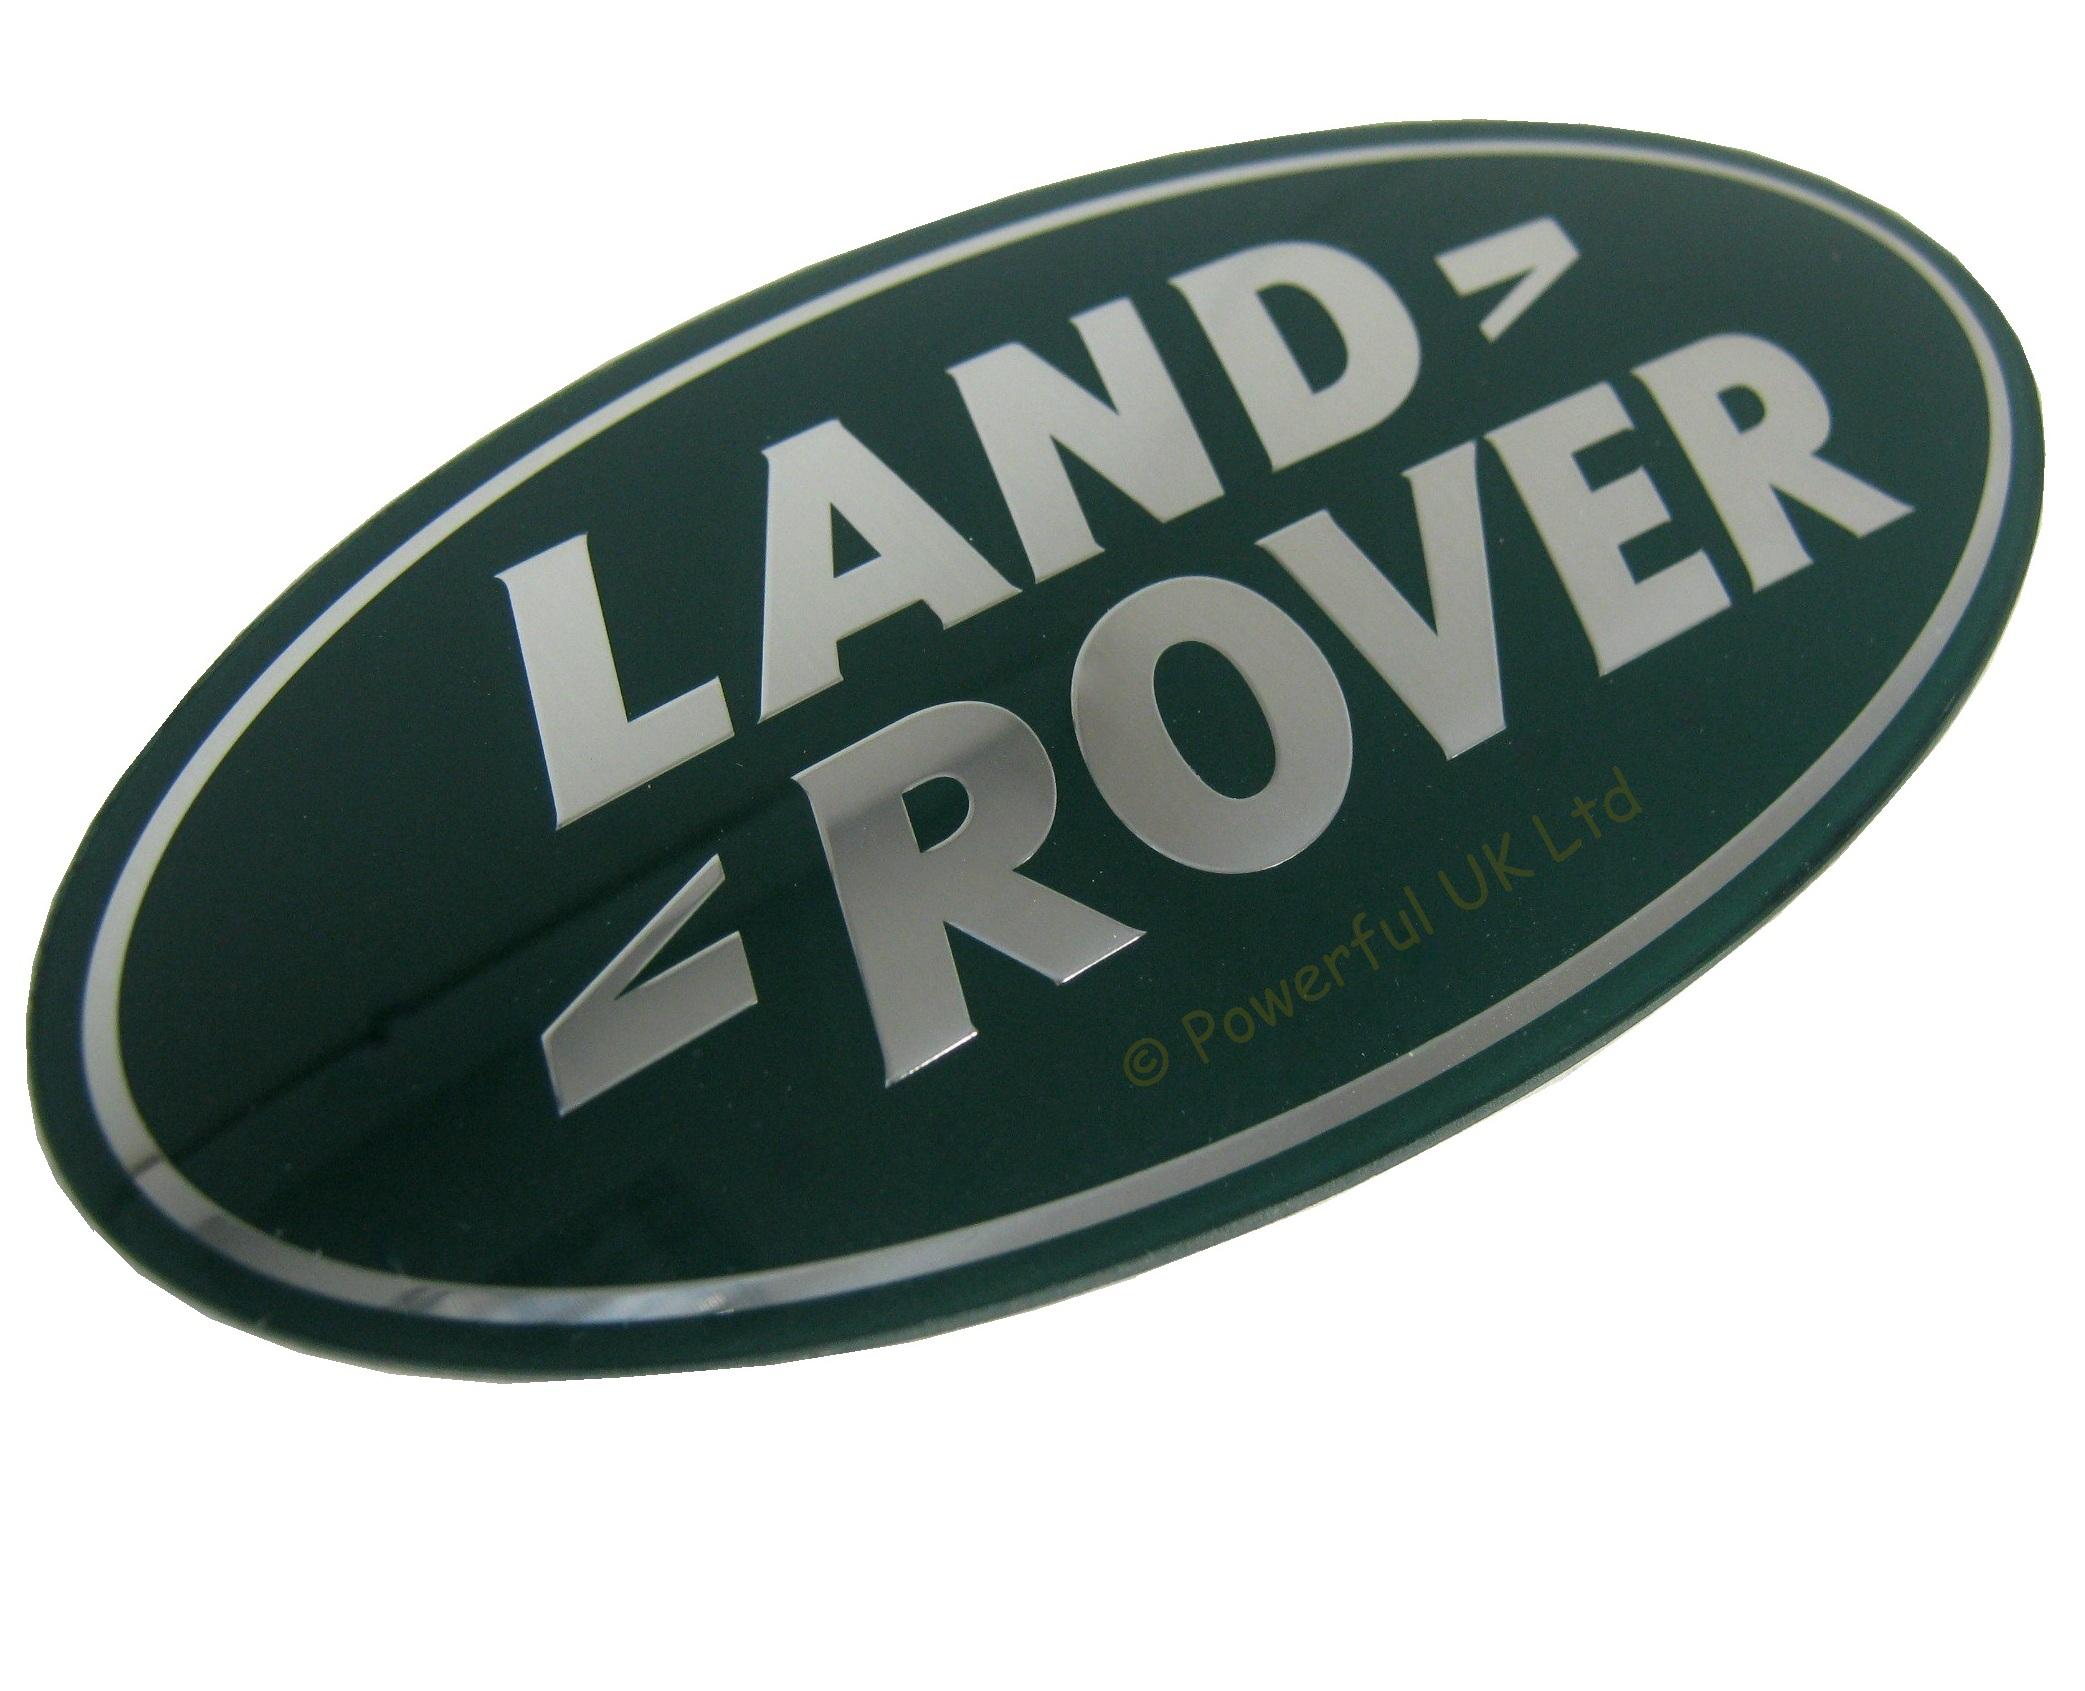 L322 freelander Discovery sport 2x Land Rover Avant // Arrière Badge range rover